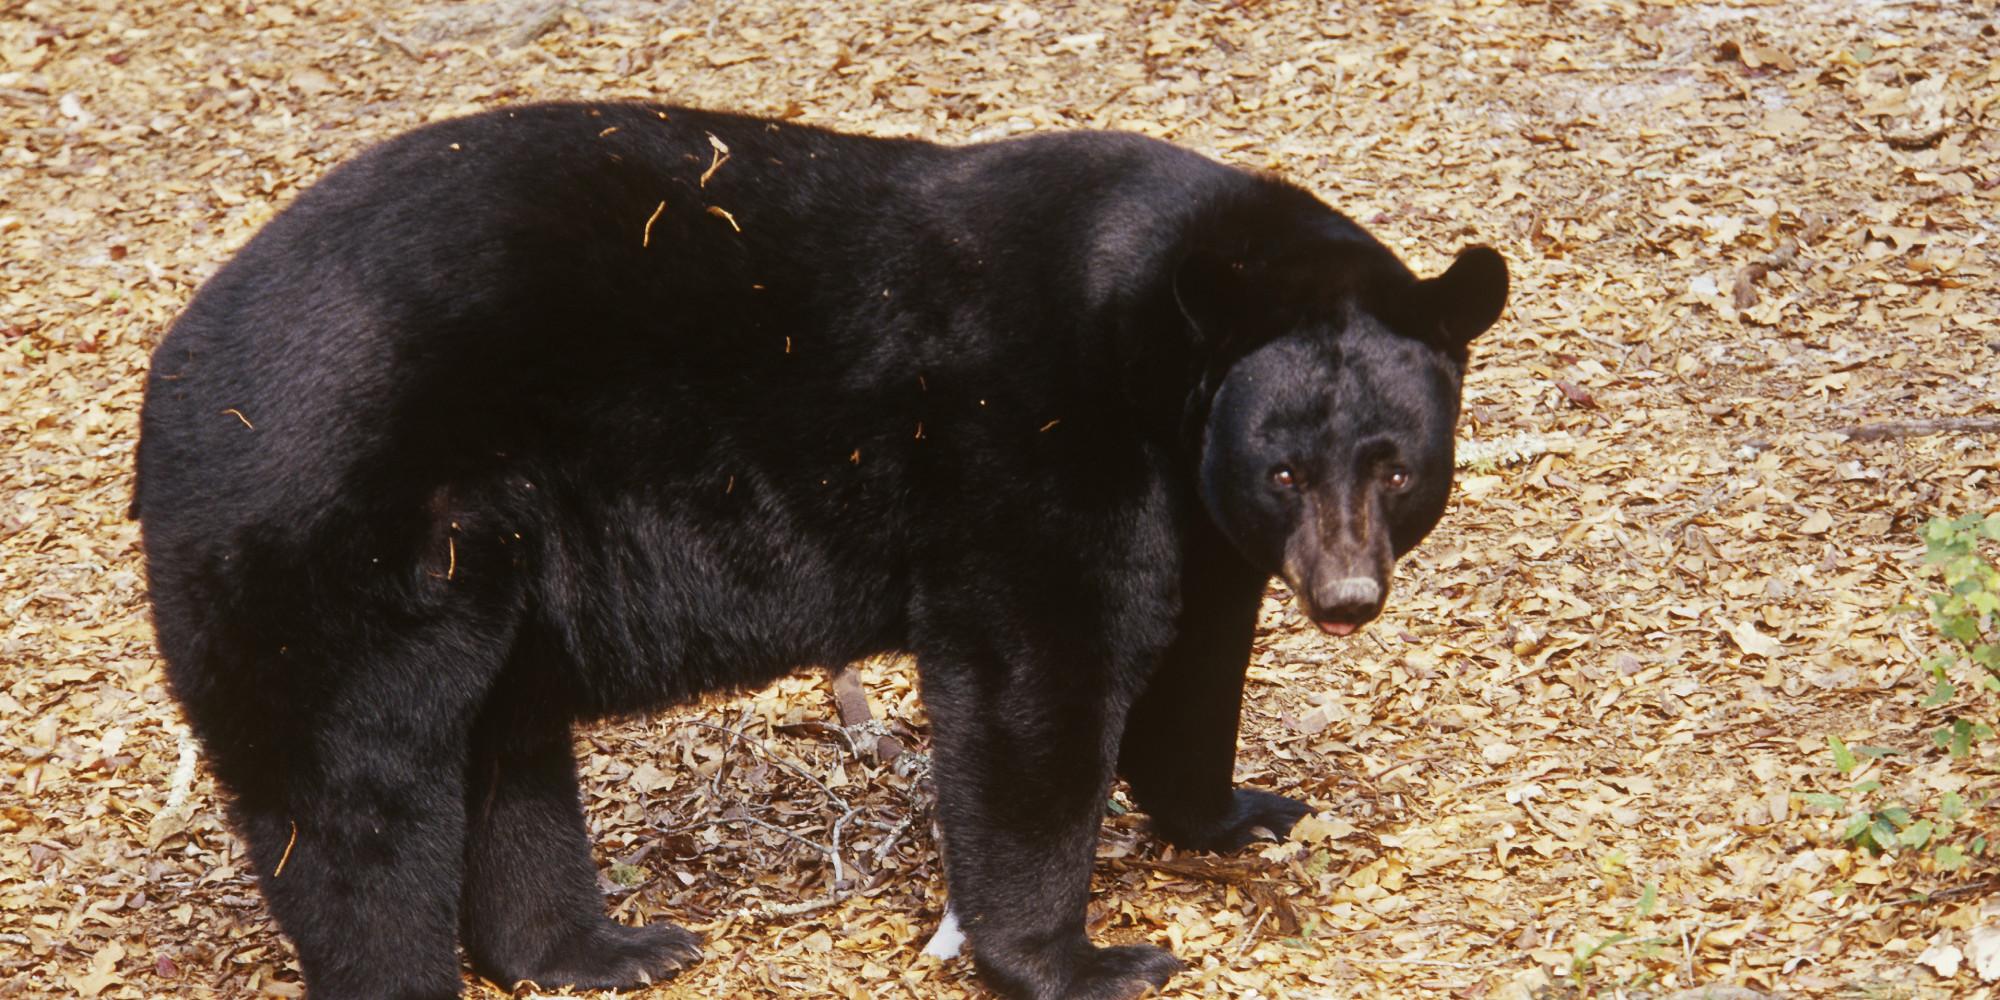 Florida Mulls Return Of Bear Hunts After Increase In Urban